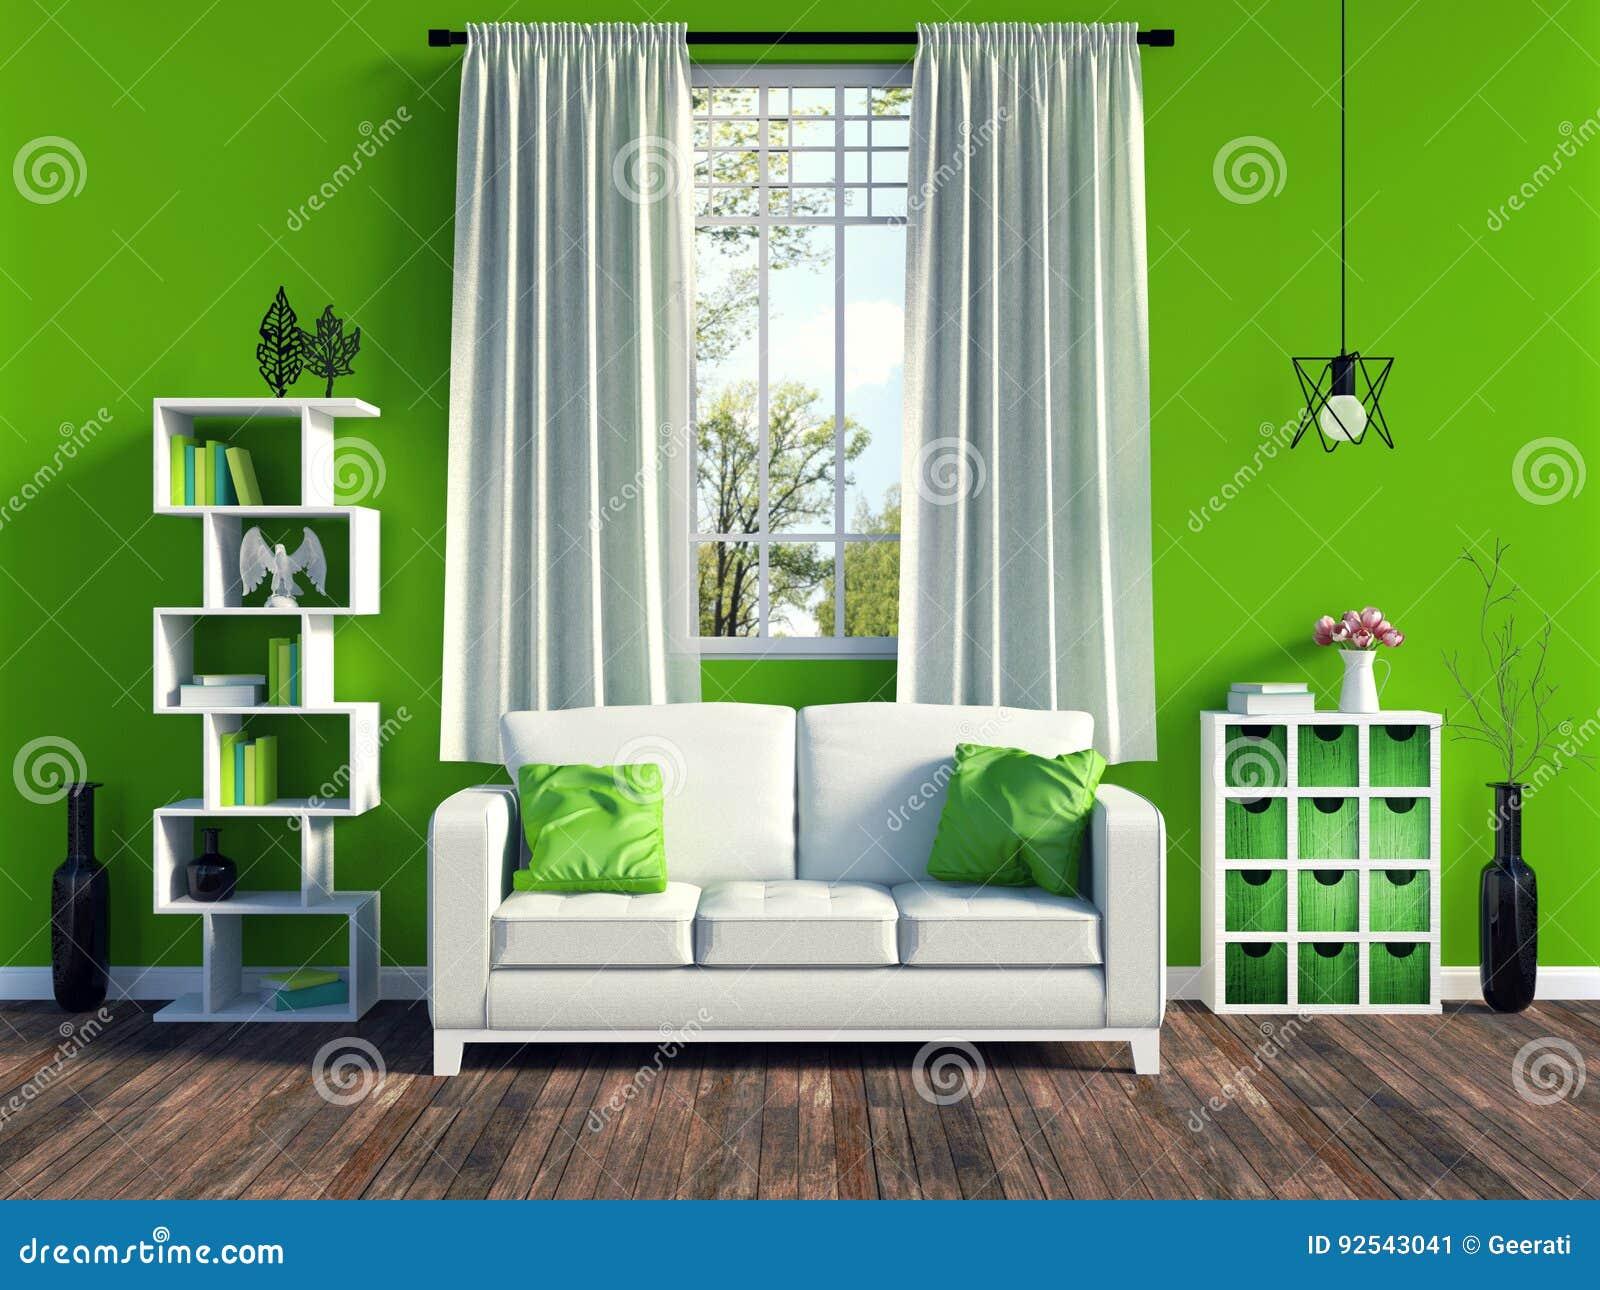 Modern groen woonkamerbinnenland met wit bank en meubilair en oude houten bevloering